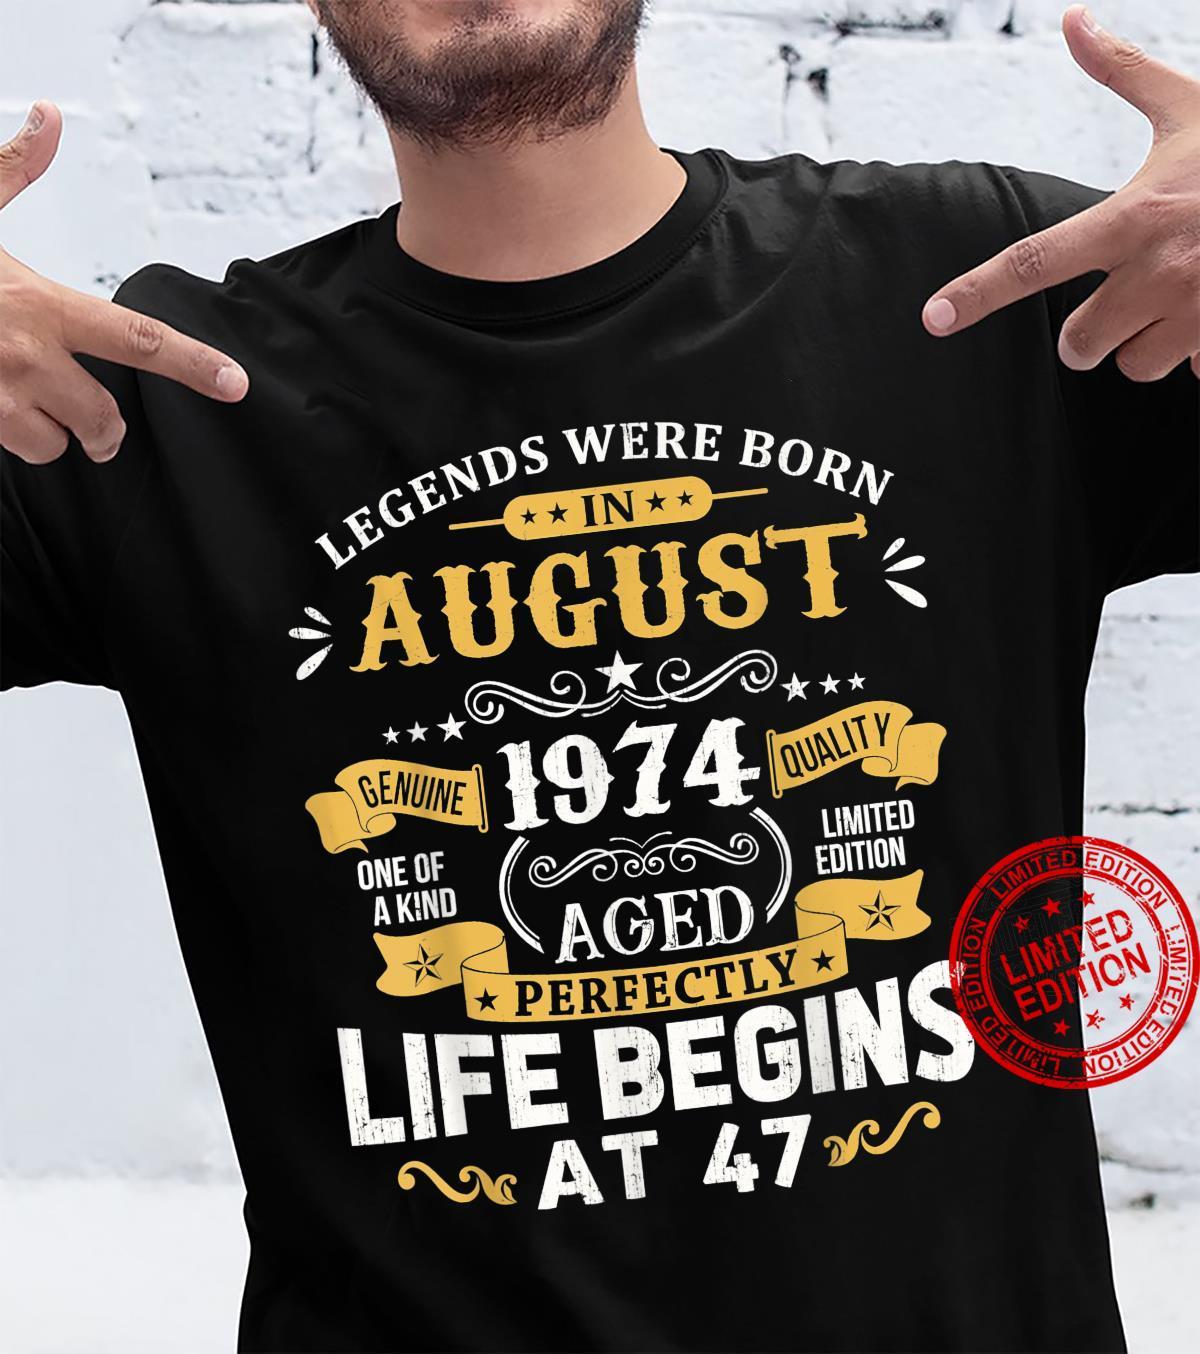 Legends Were Born In August 1974 Shirt 47th Birthday Shirt